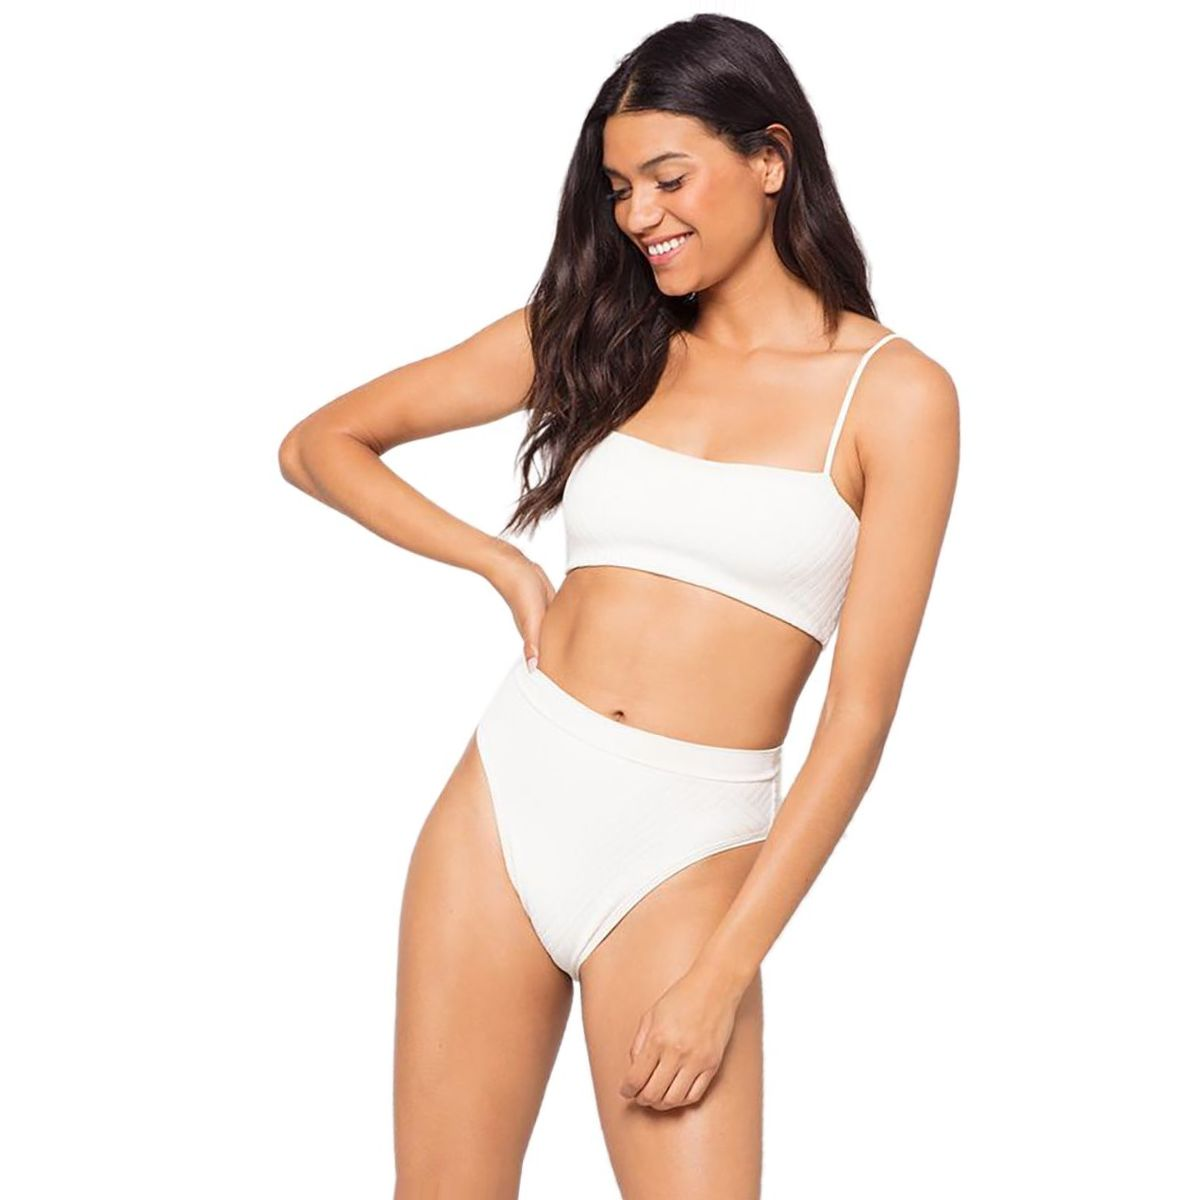 L Space Crossroads Texture Frenchi Bikini Bottom - Women's